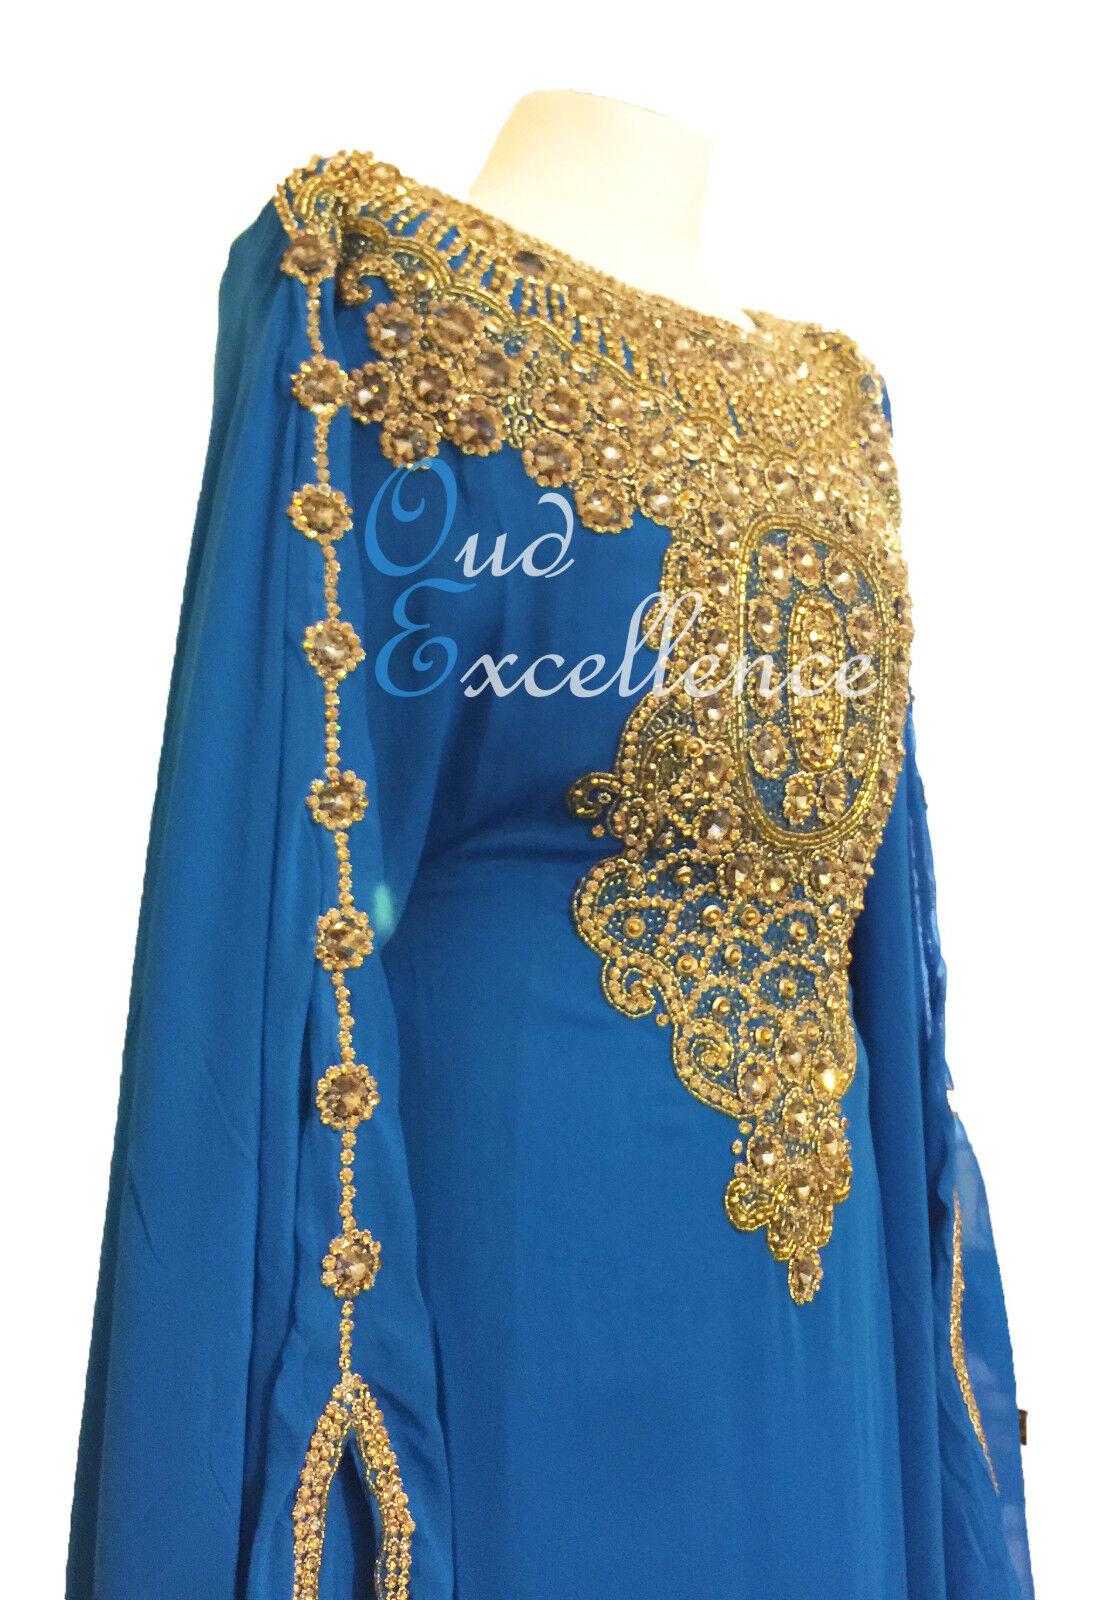 Elegant Fully Lined Arabian Farasha - - - Numerous Colours - Maxi Dress Abaya | Authentische Garantie  | Hohe Sicherheit  | Qualität  400ab6